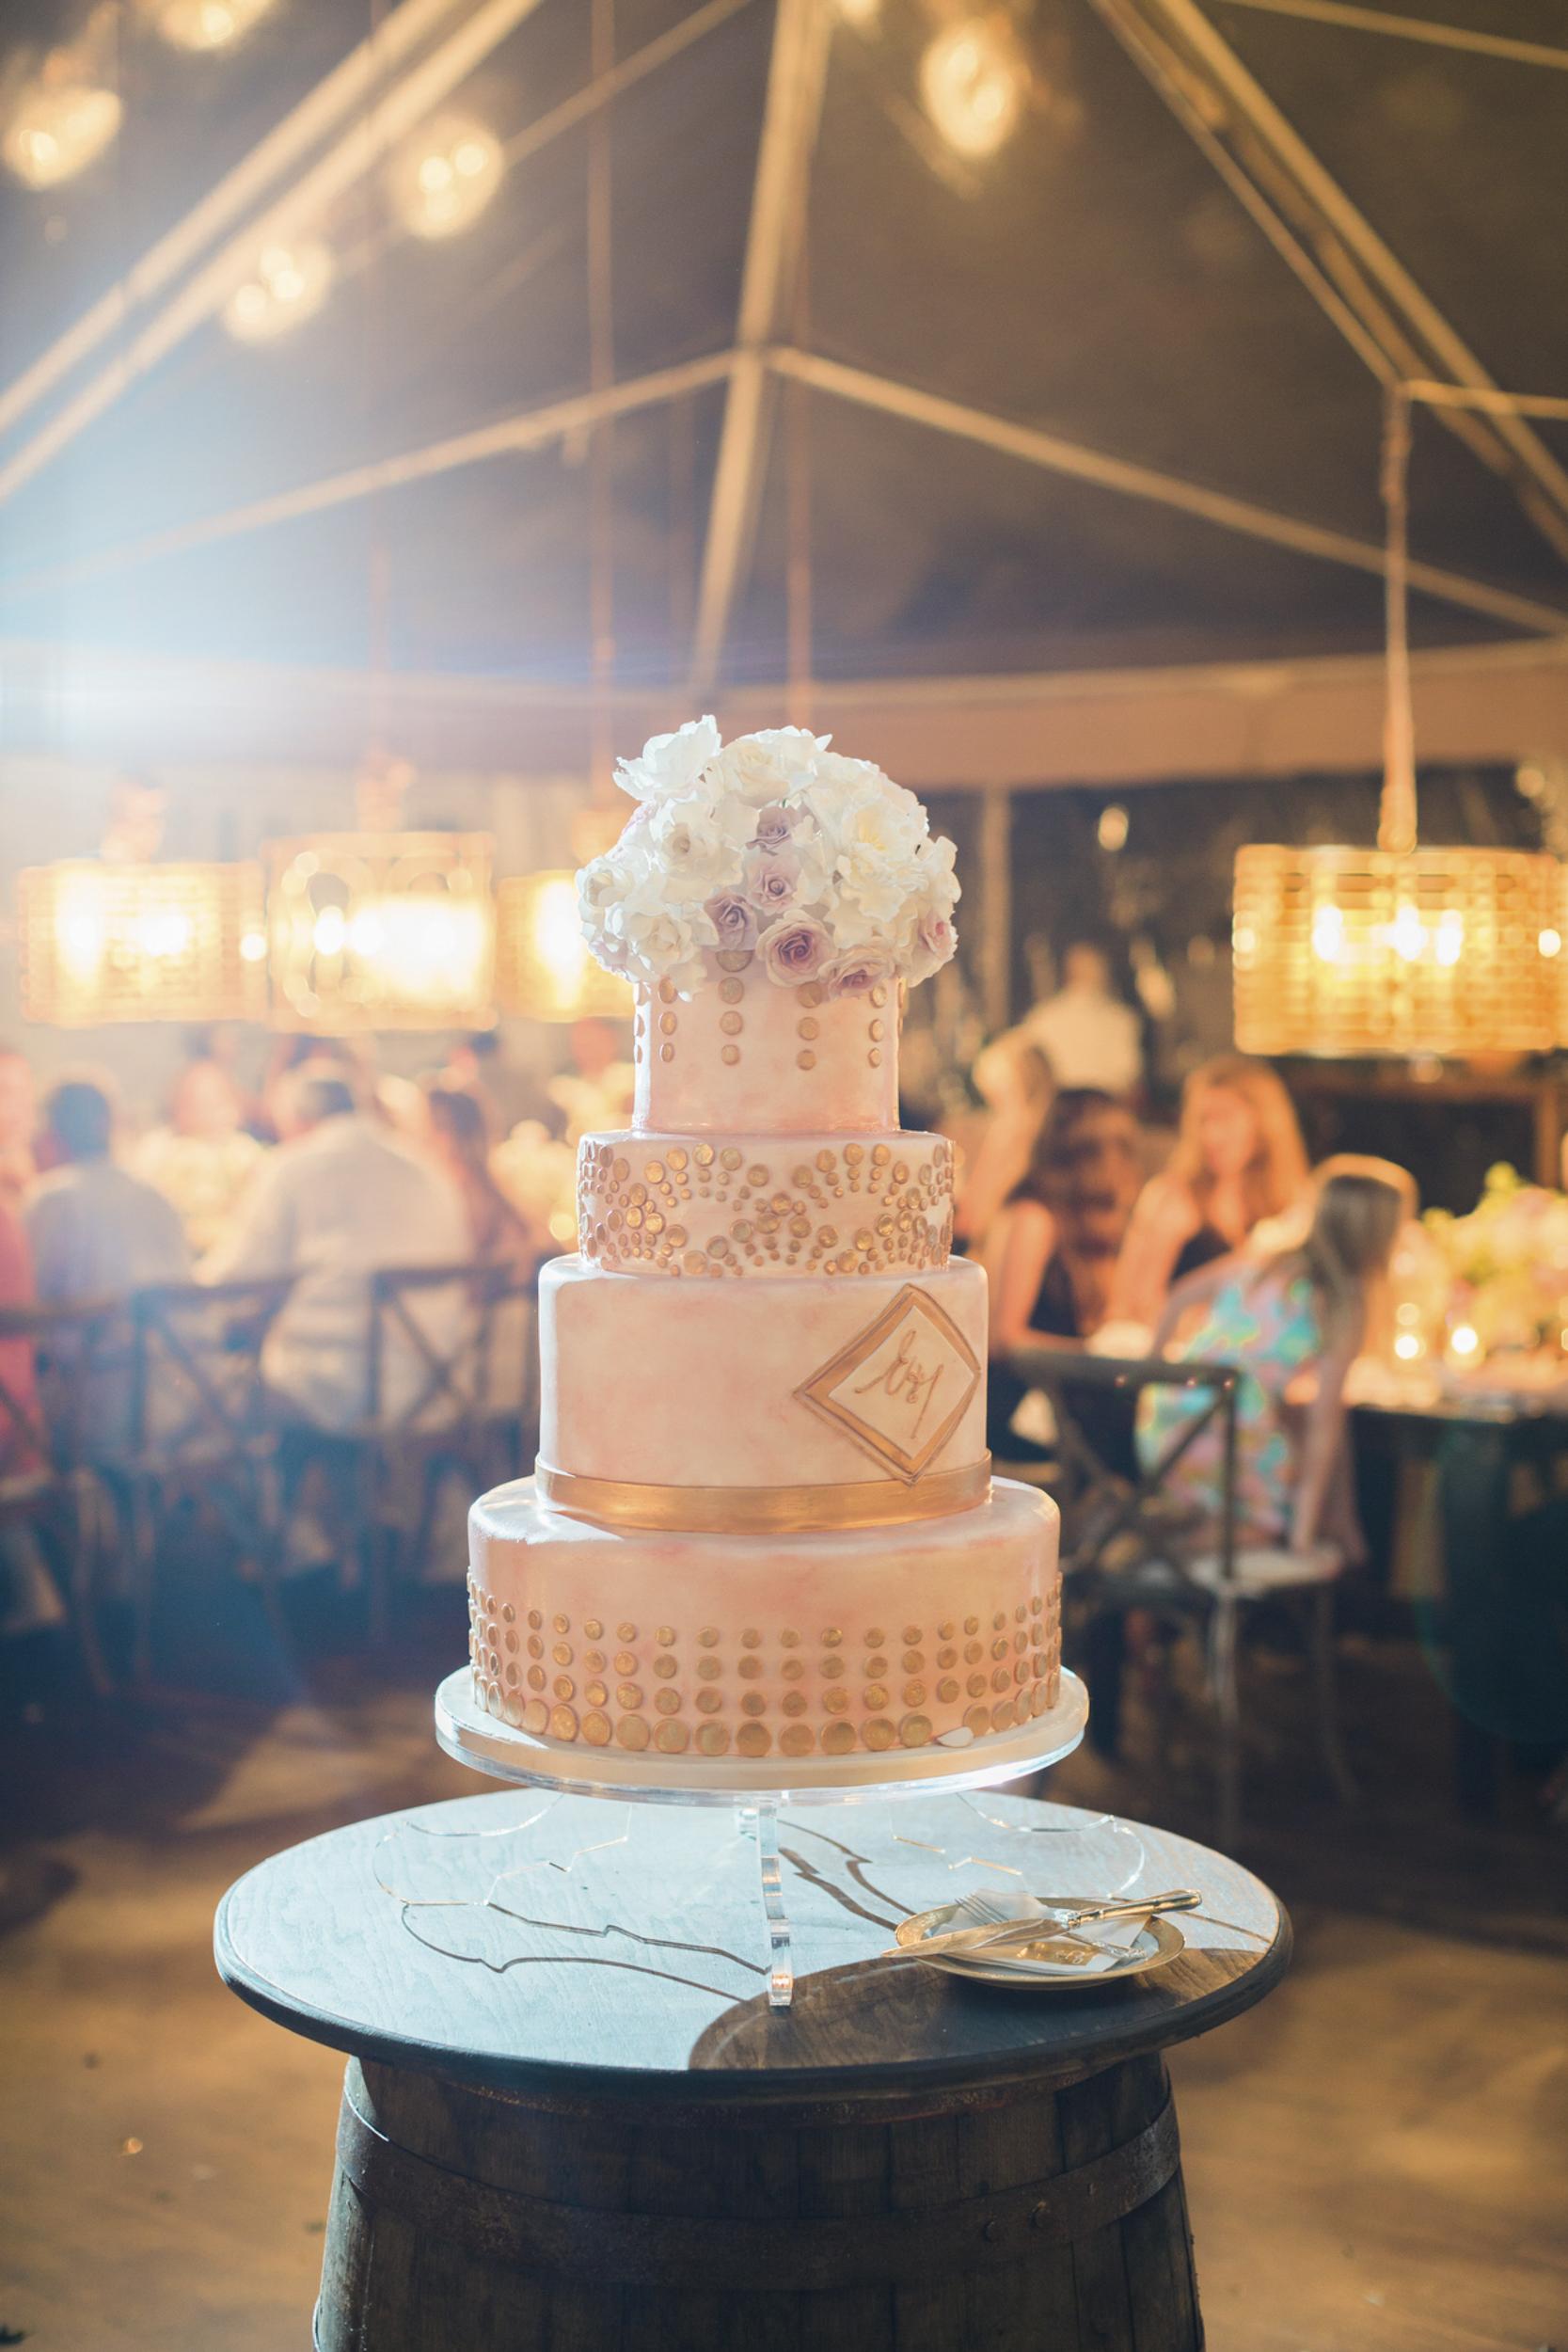 south_carolina_farm_wedding_rustic_chic_surprise_secret_luxe_wedding_bachelorette_emily_maynard_real_weddings-13.jpg